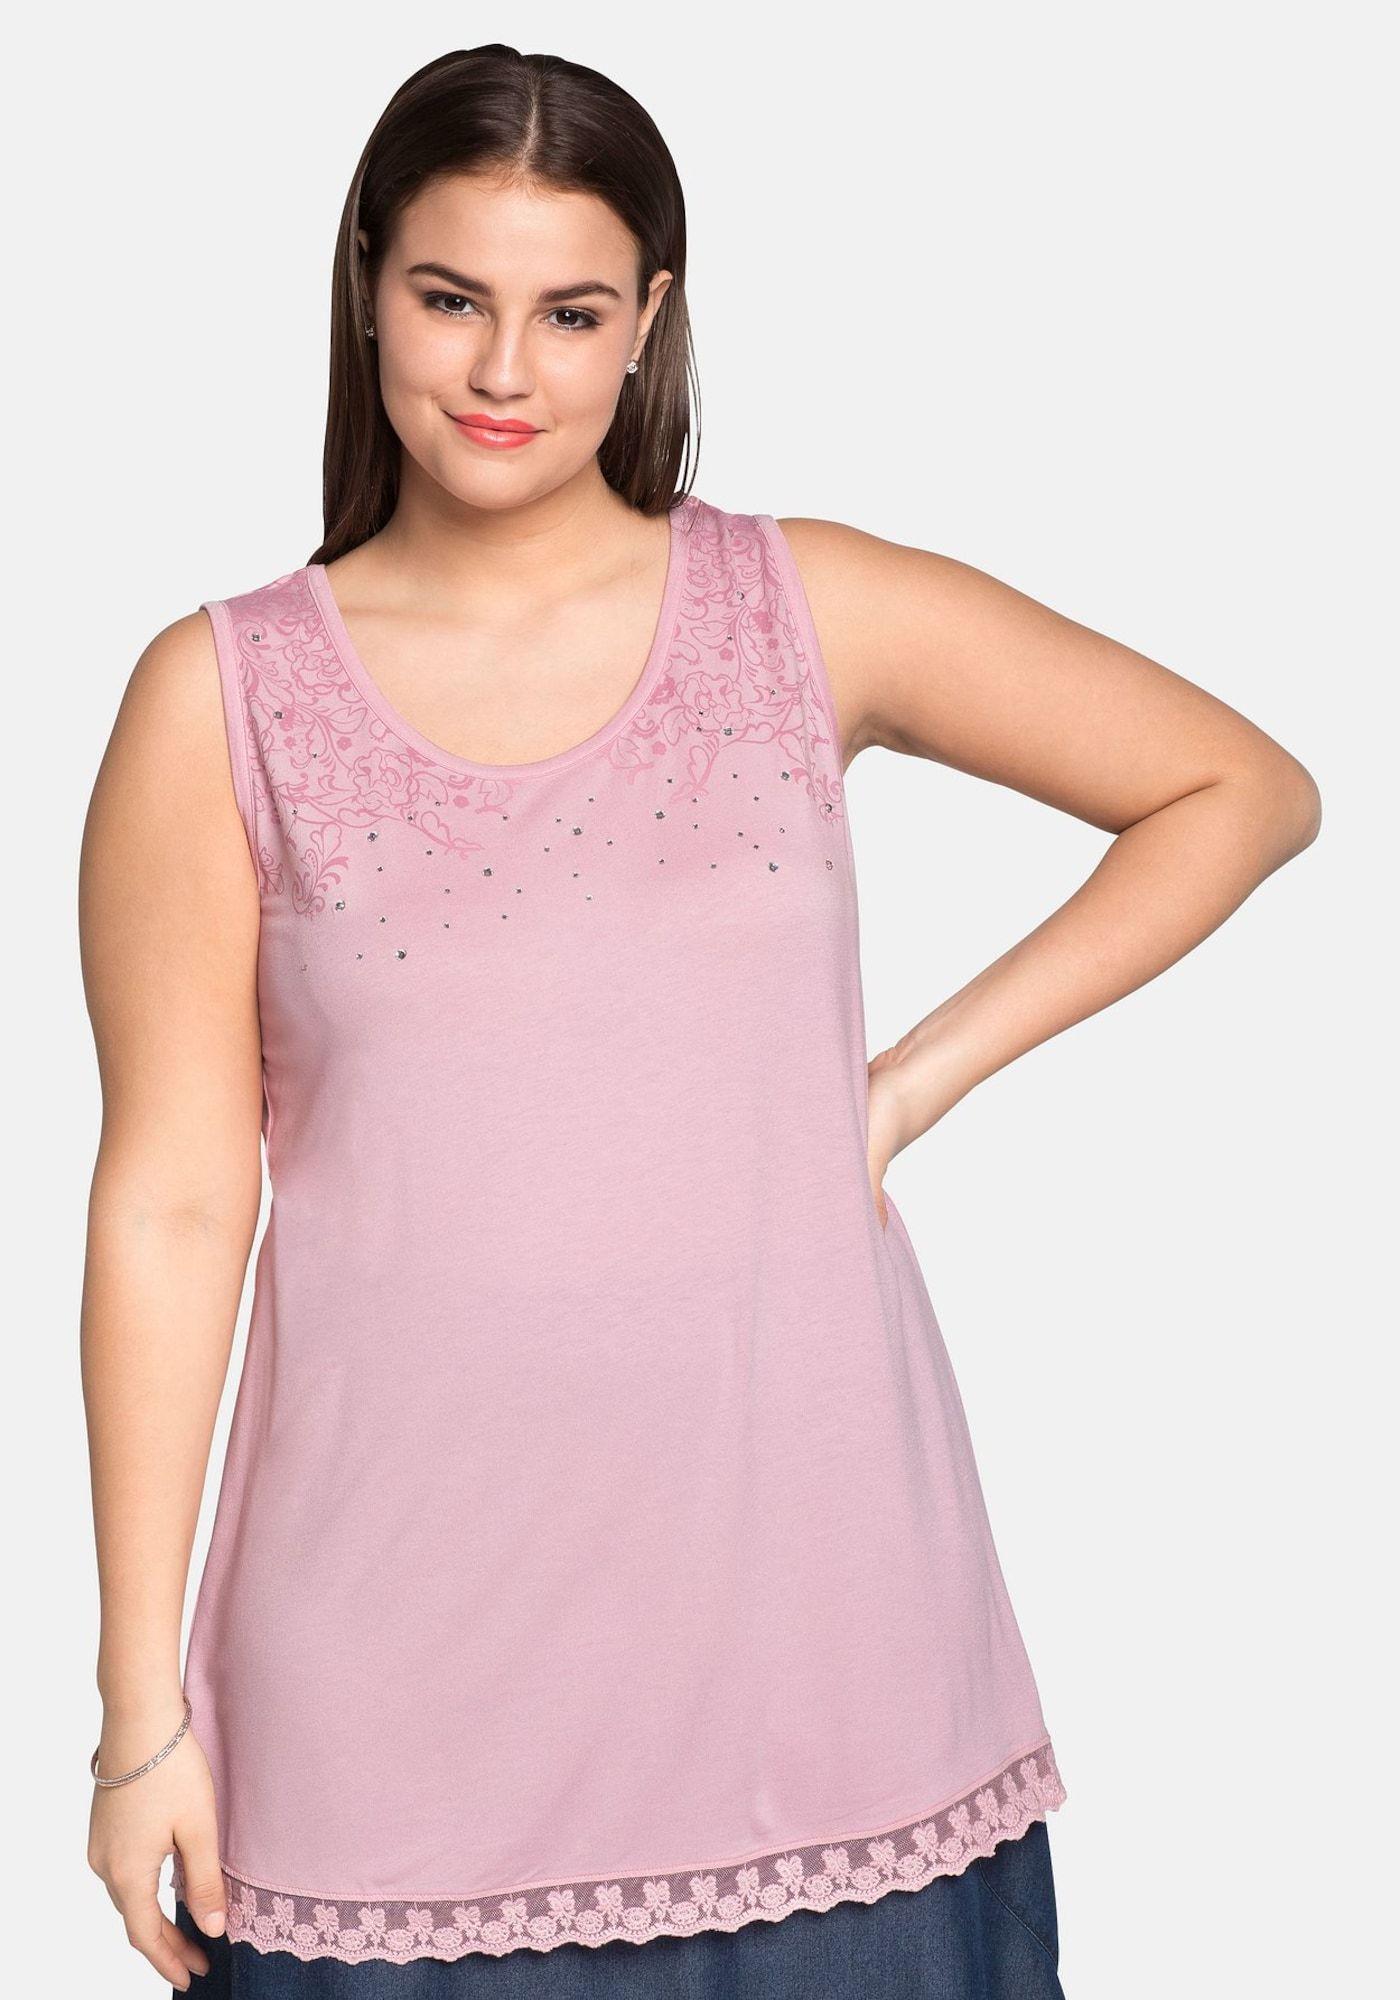 SHEEGO Top Damen, Rosa, Größe XL/XXL #rosaspitzenkleider SHEEGO Top Damen, Rosa, Größe XL/XXL #rosaspitzenkleider